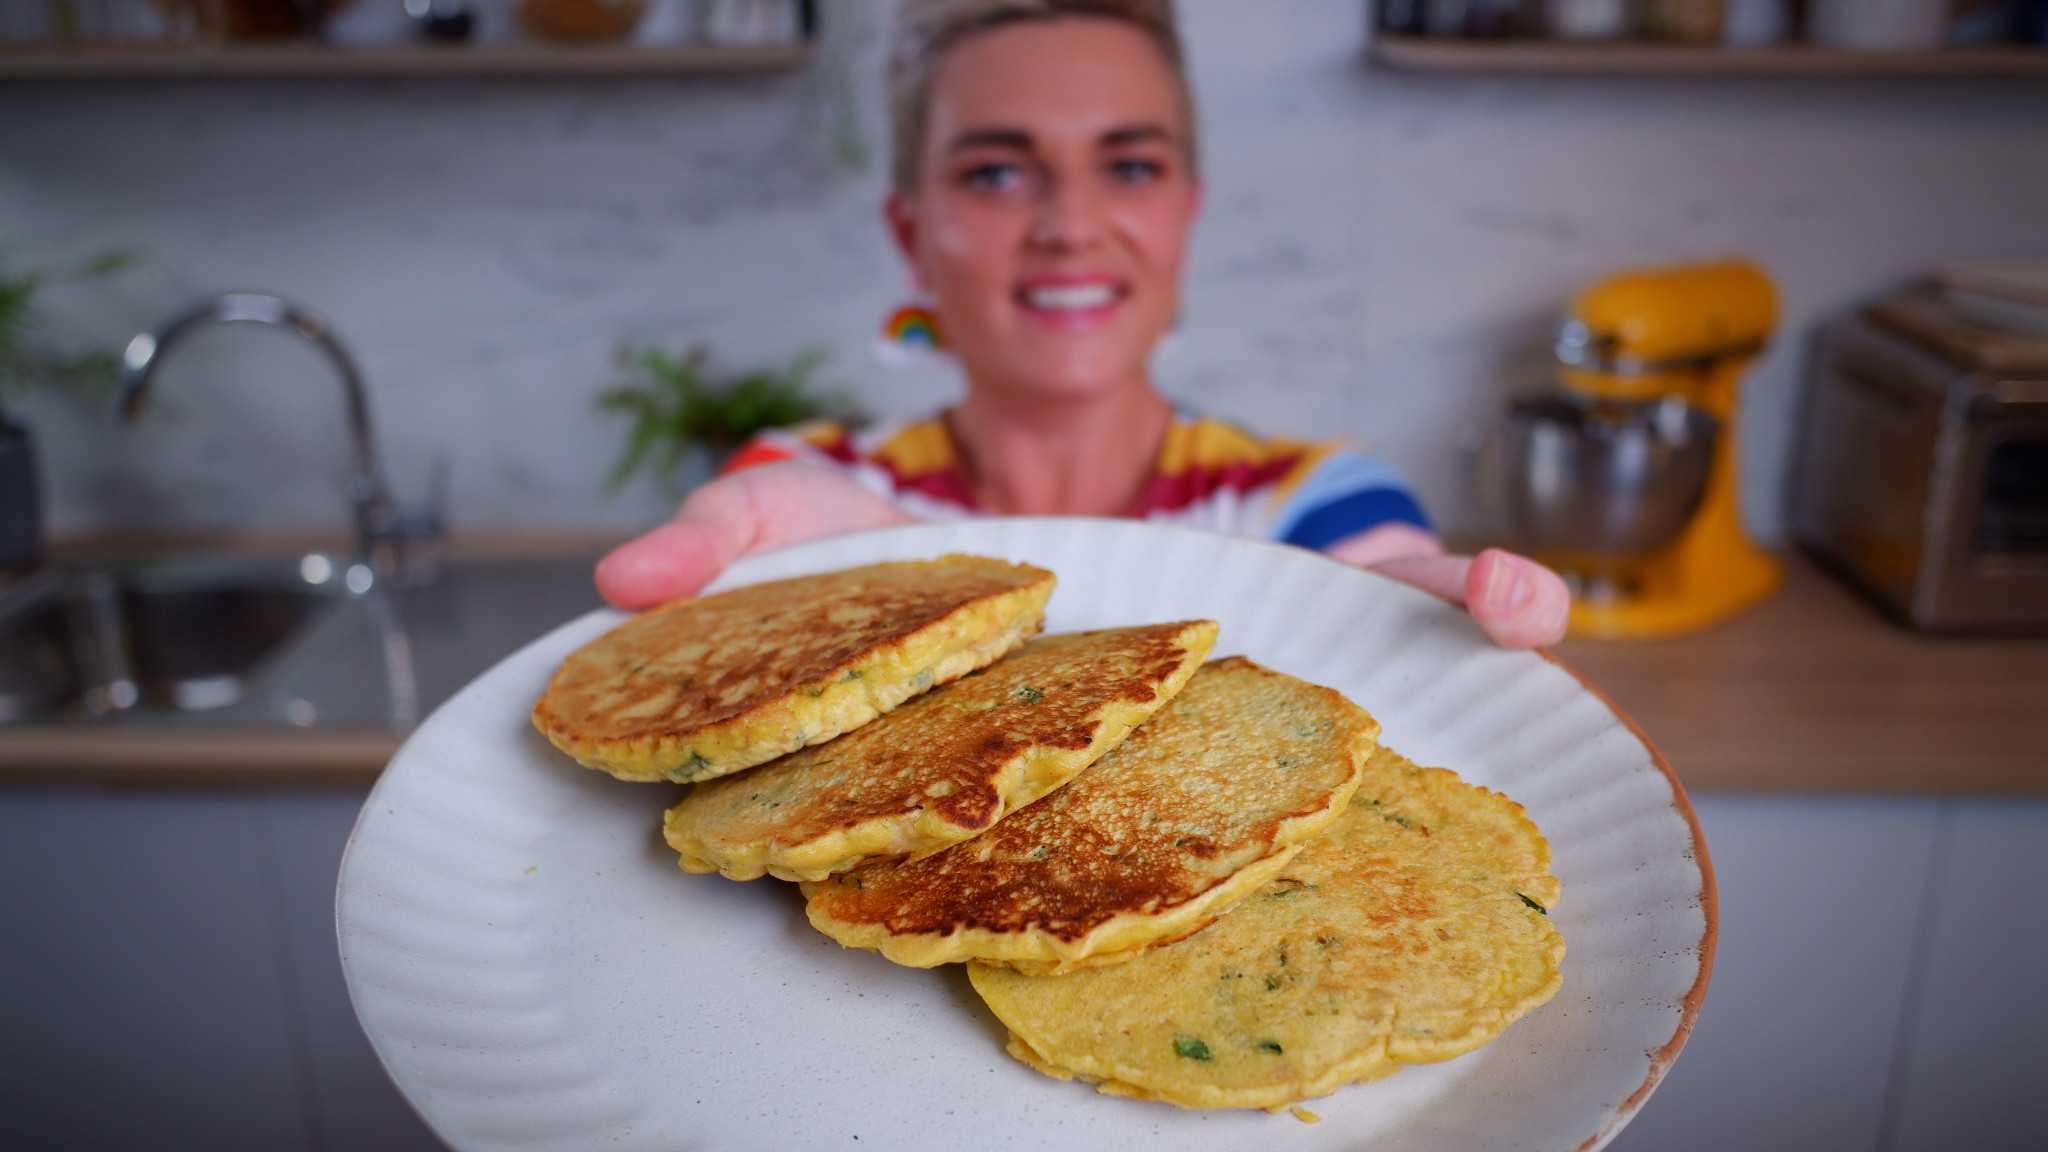 9Honey's Quarantine Kitchen cook-along: three ingredient chickpea pancakes